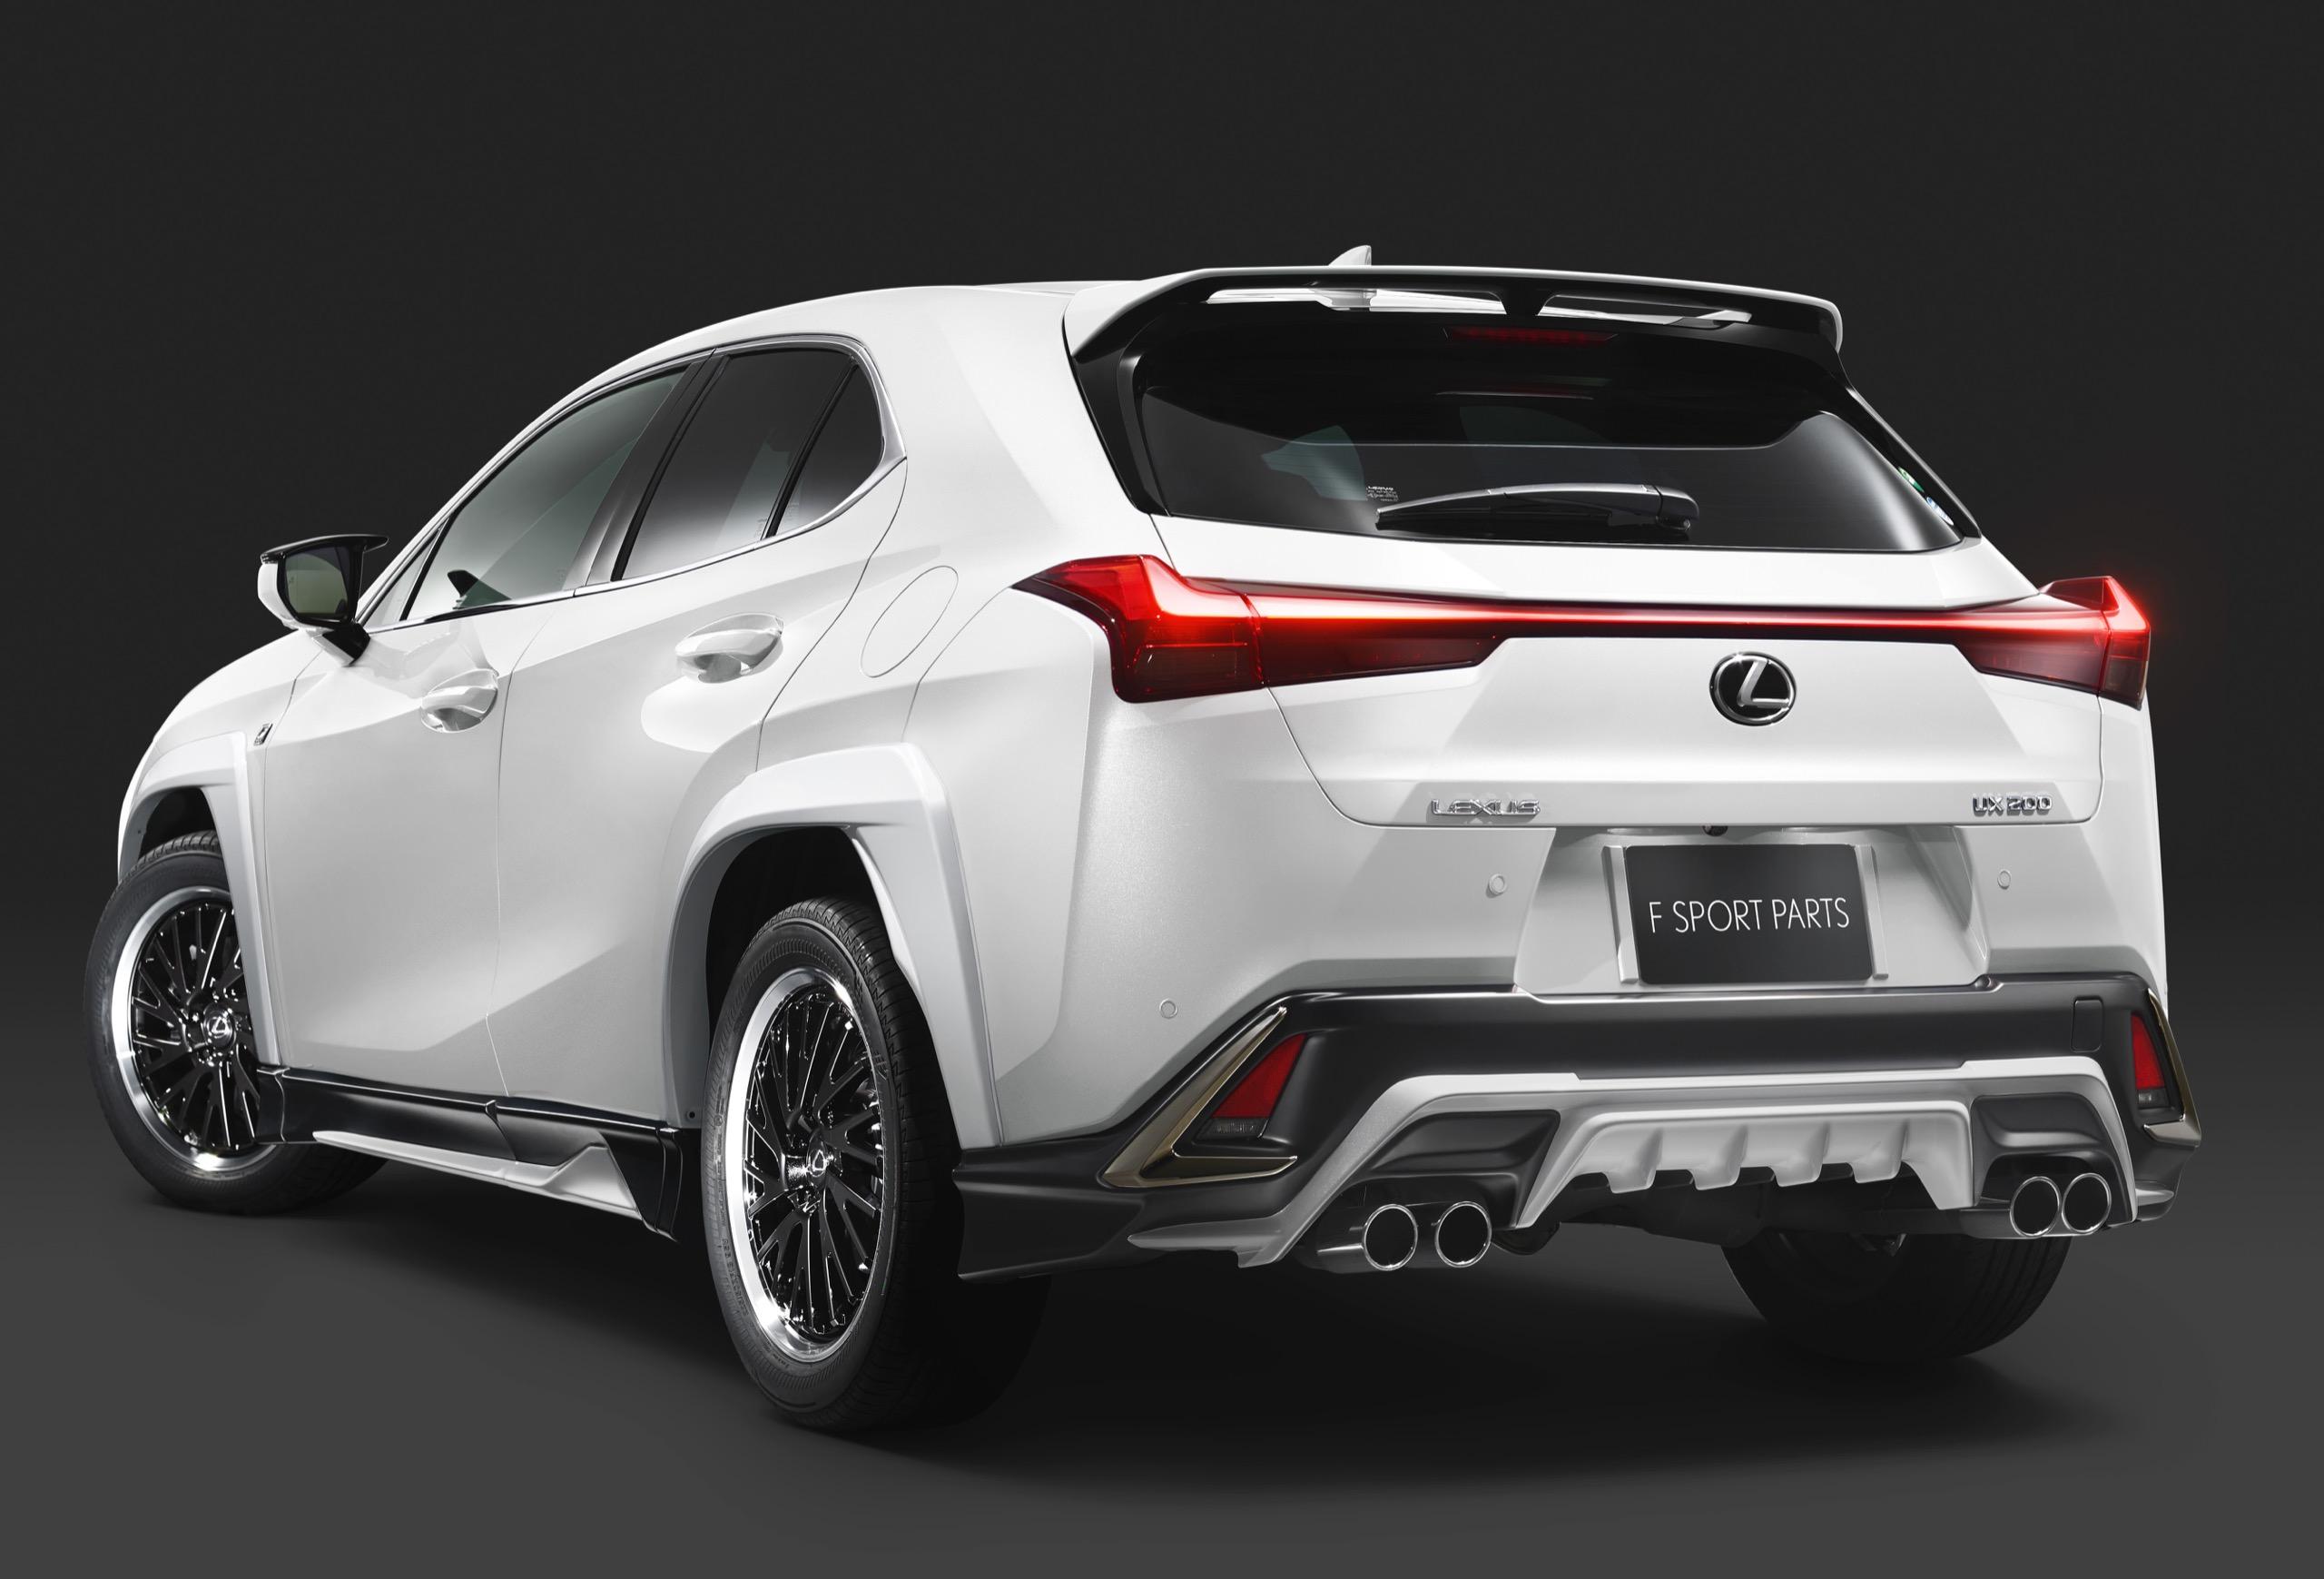 Lexus F Sport Price >> TRD Japan Releases Body Kit for New Lexus UX F SPORT Crossover | Lexus Enthusiast